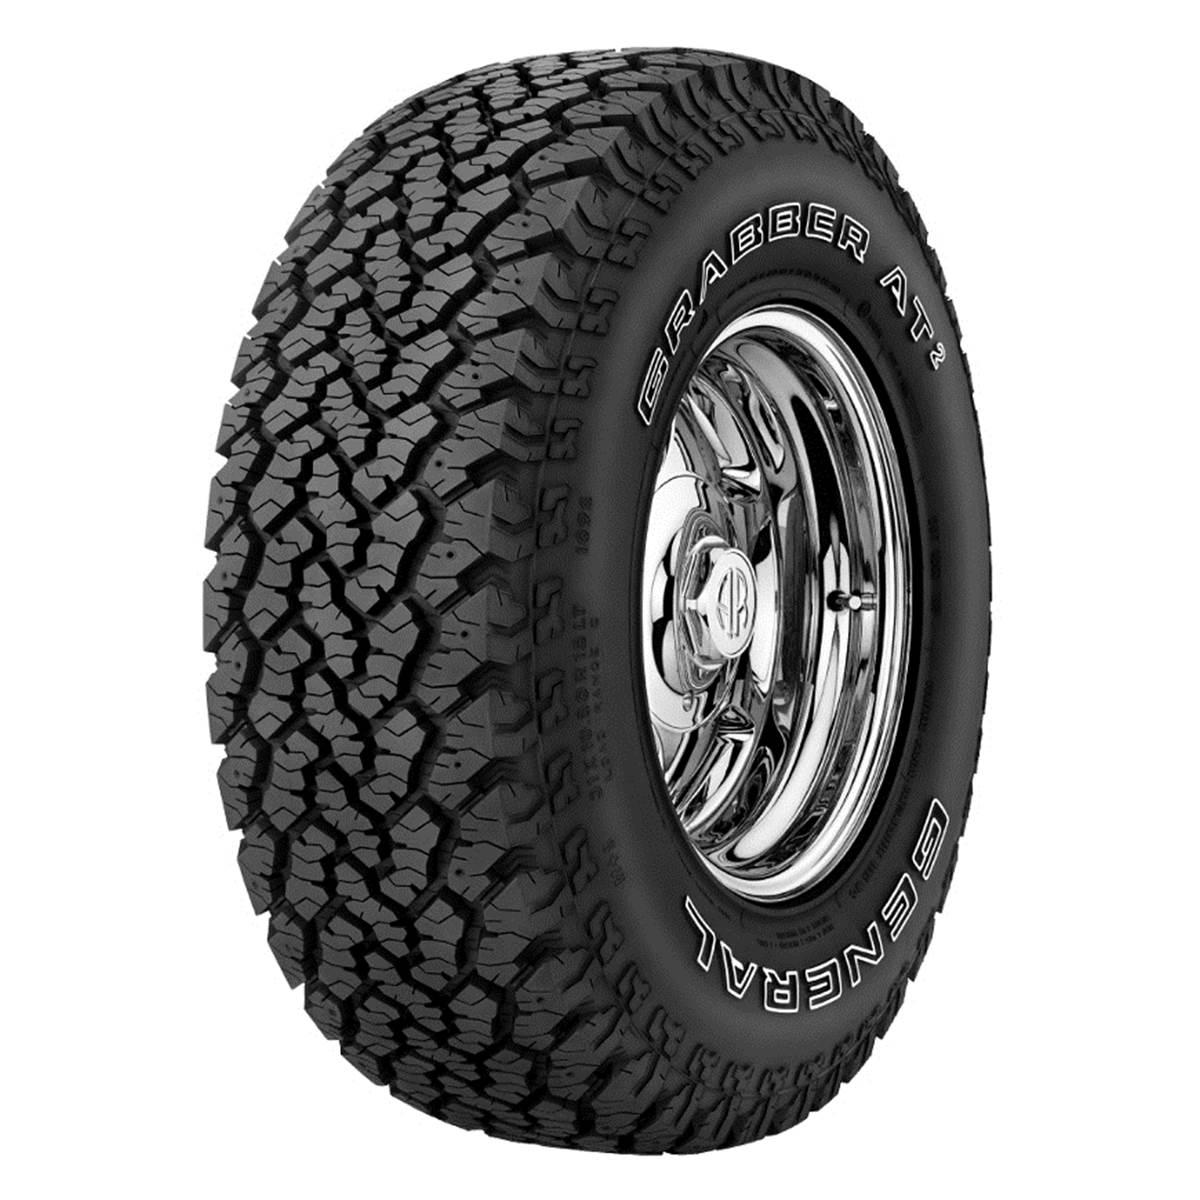 pneu 4x4 general tire 23570r16 106t grabber at2 feu vert produits et bons plans general tire. Black Bedroom Furniture Sets. Home Design Ideas